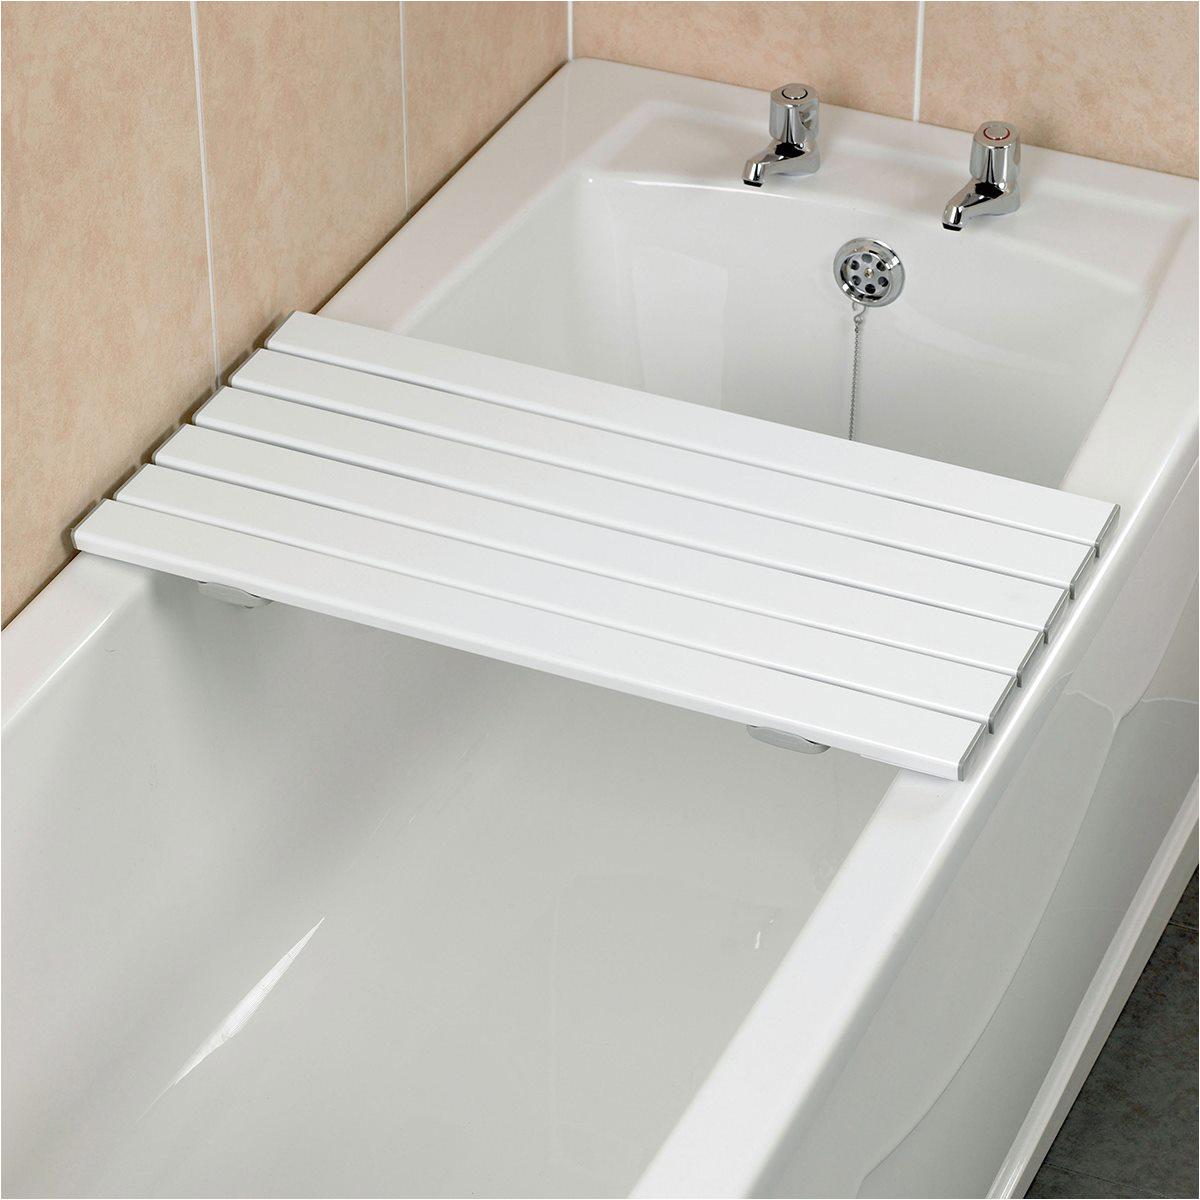 Bathtubs soaking or Savanah Slatted Bath Board Low Prices